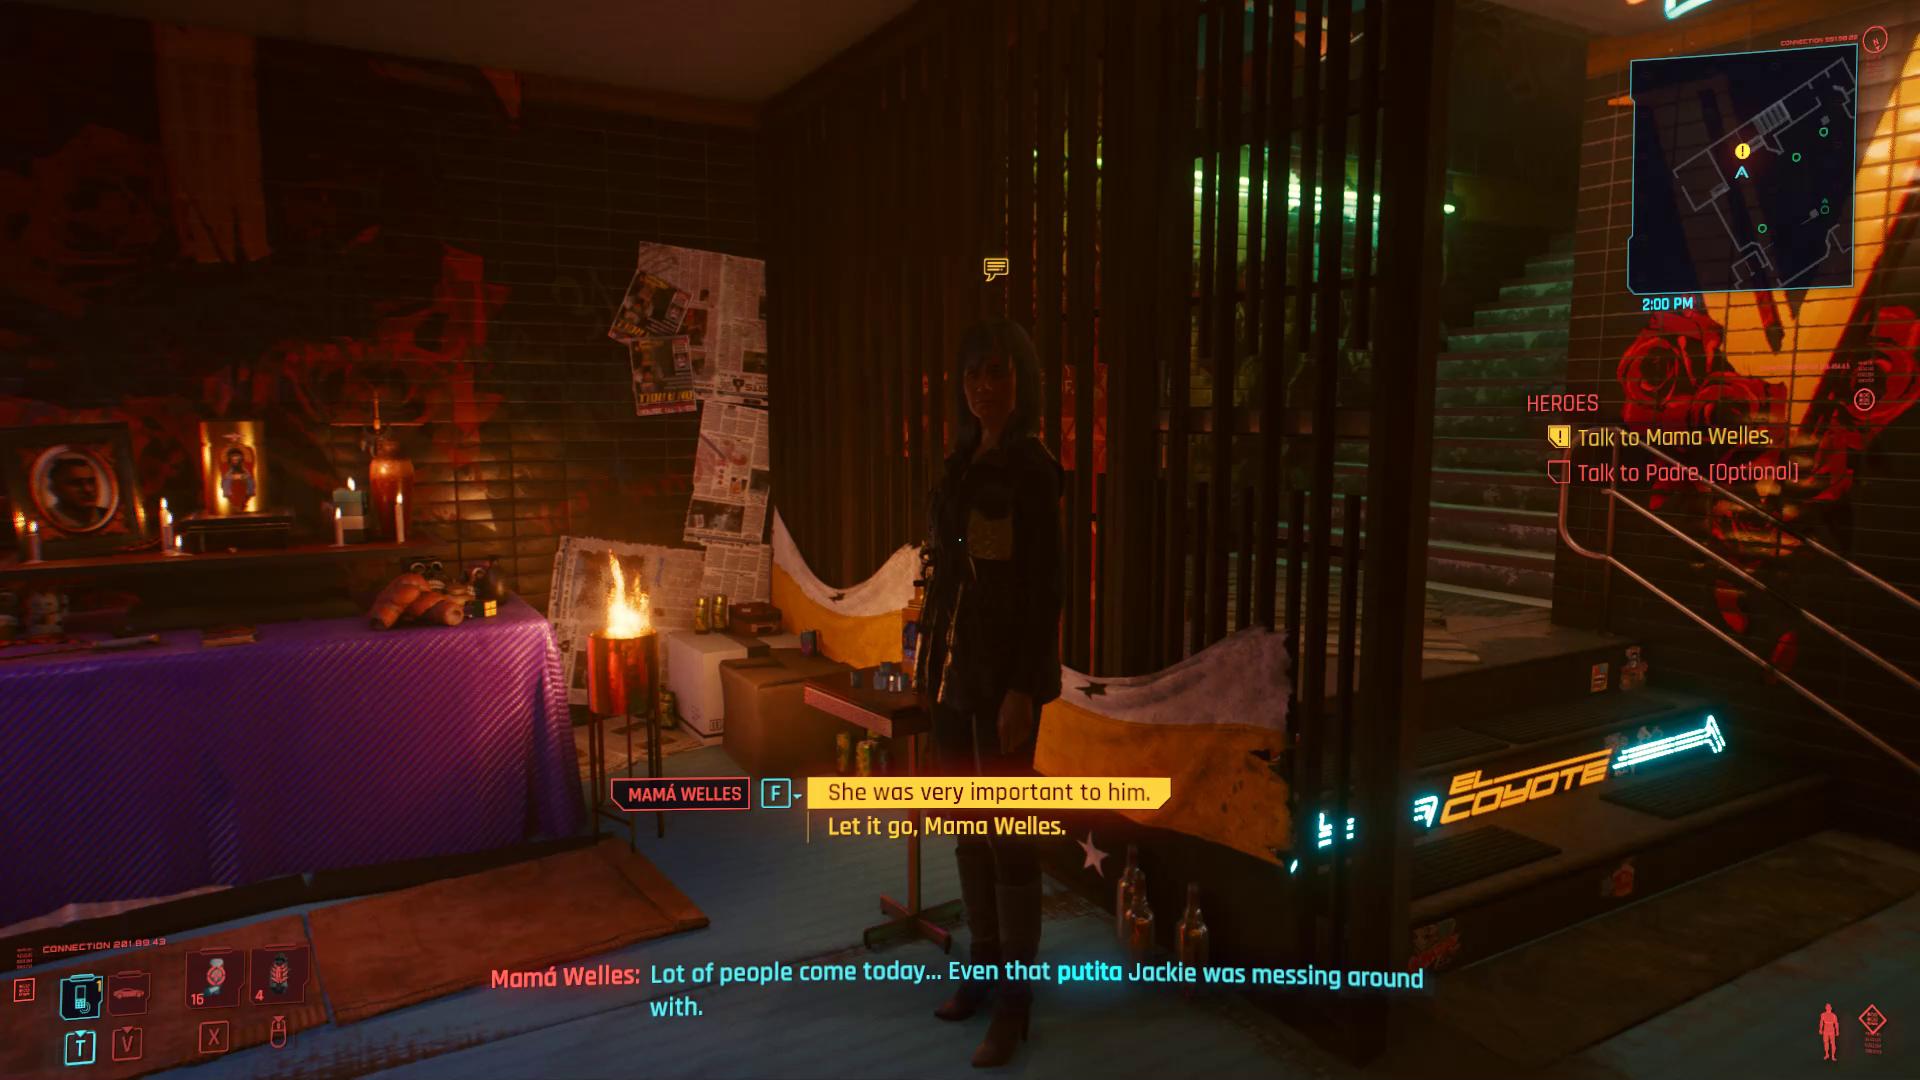 Cyberpunk 2077 Misty est important